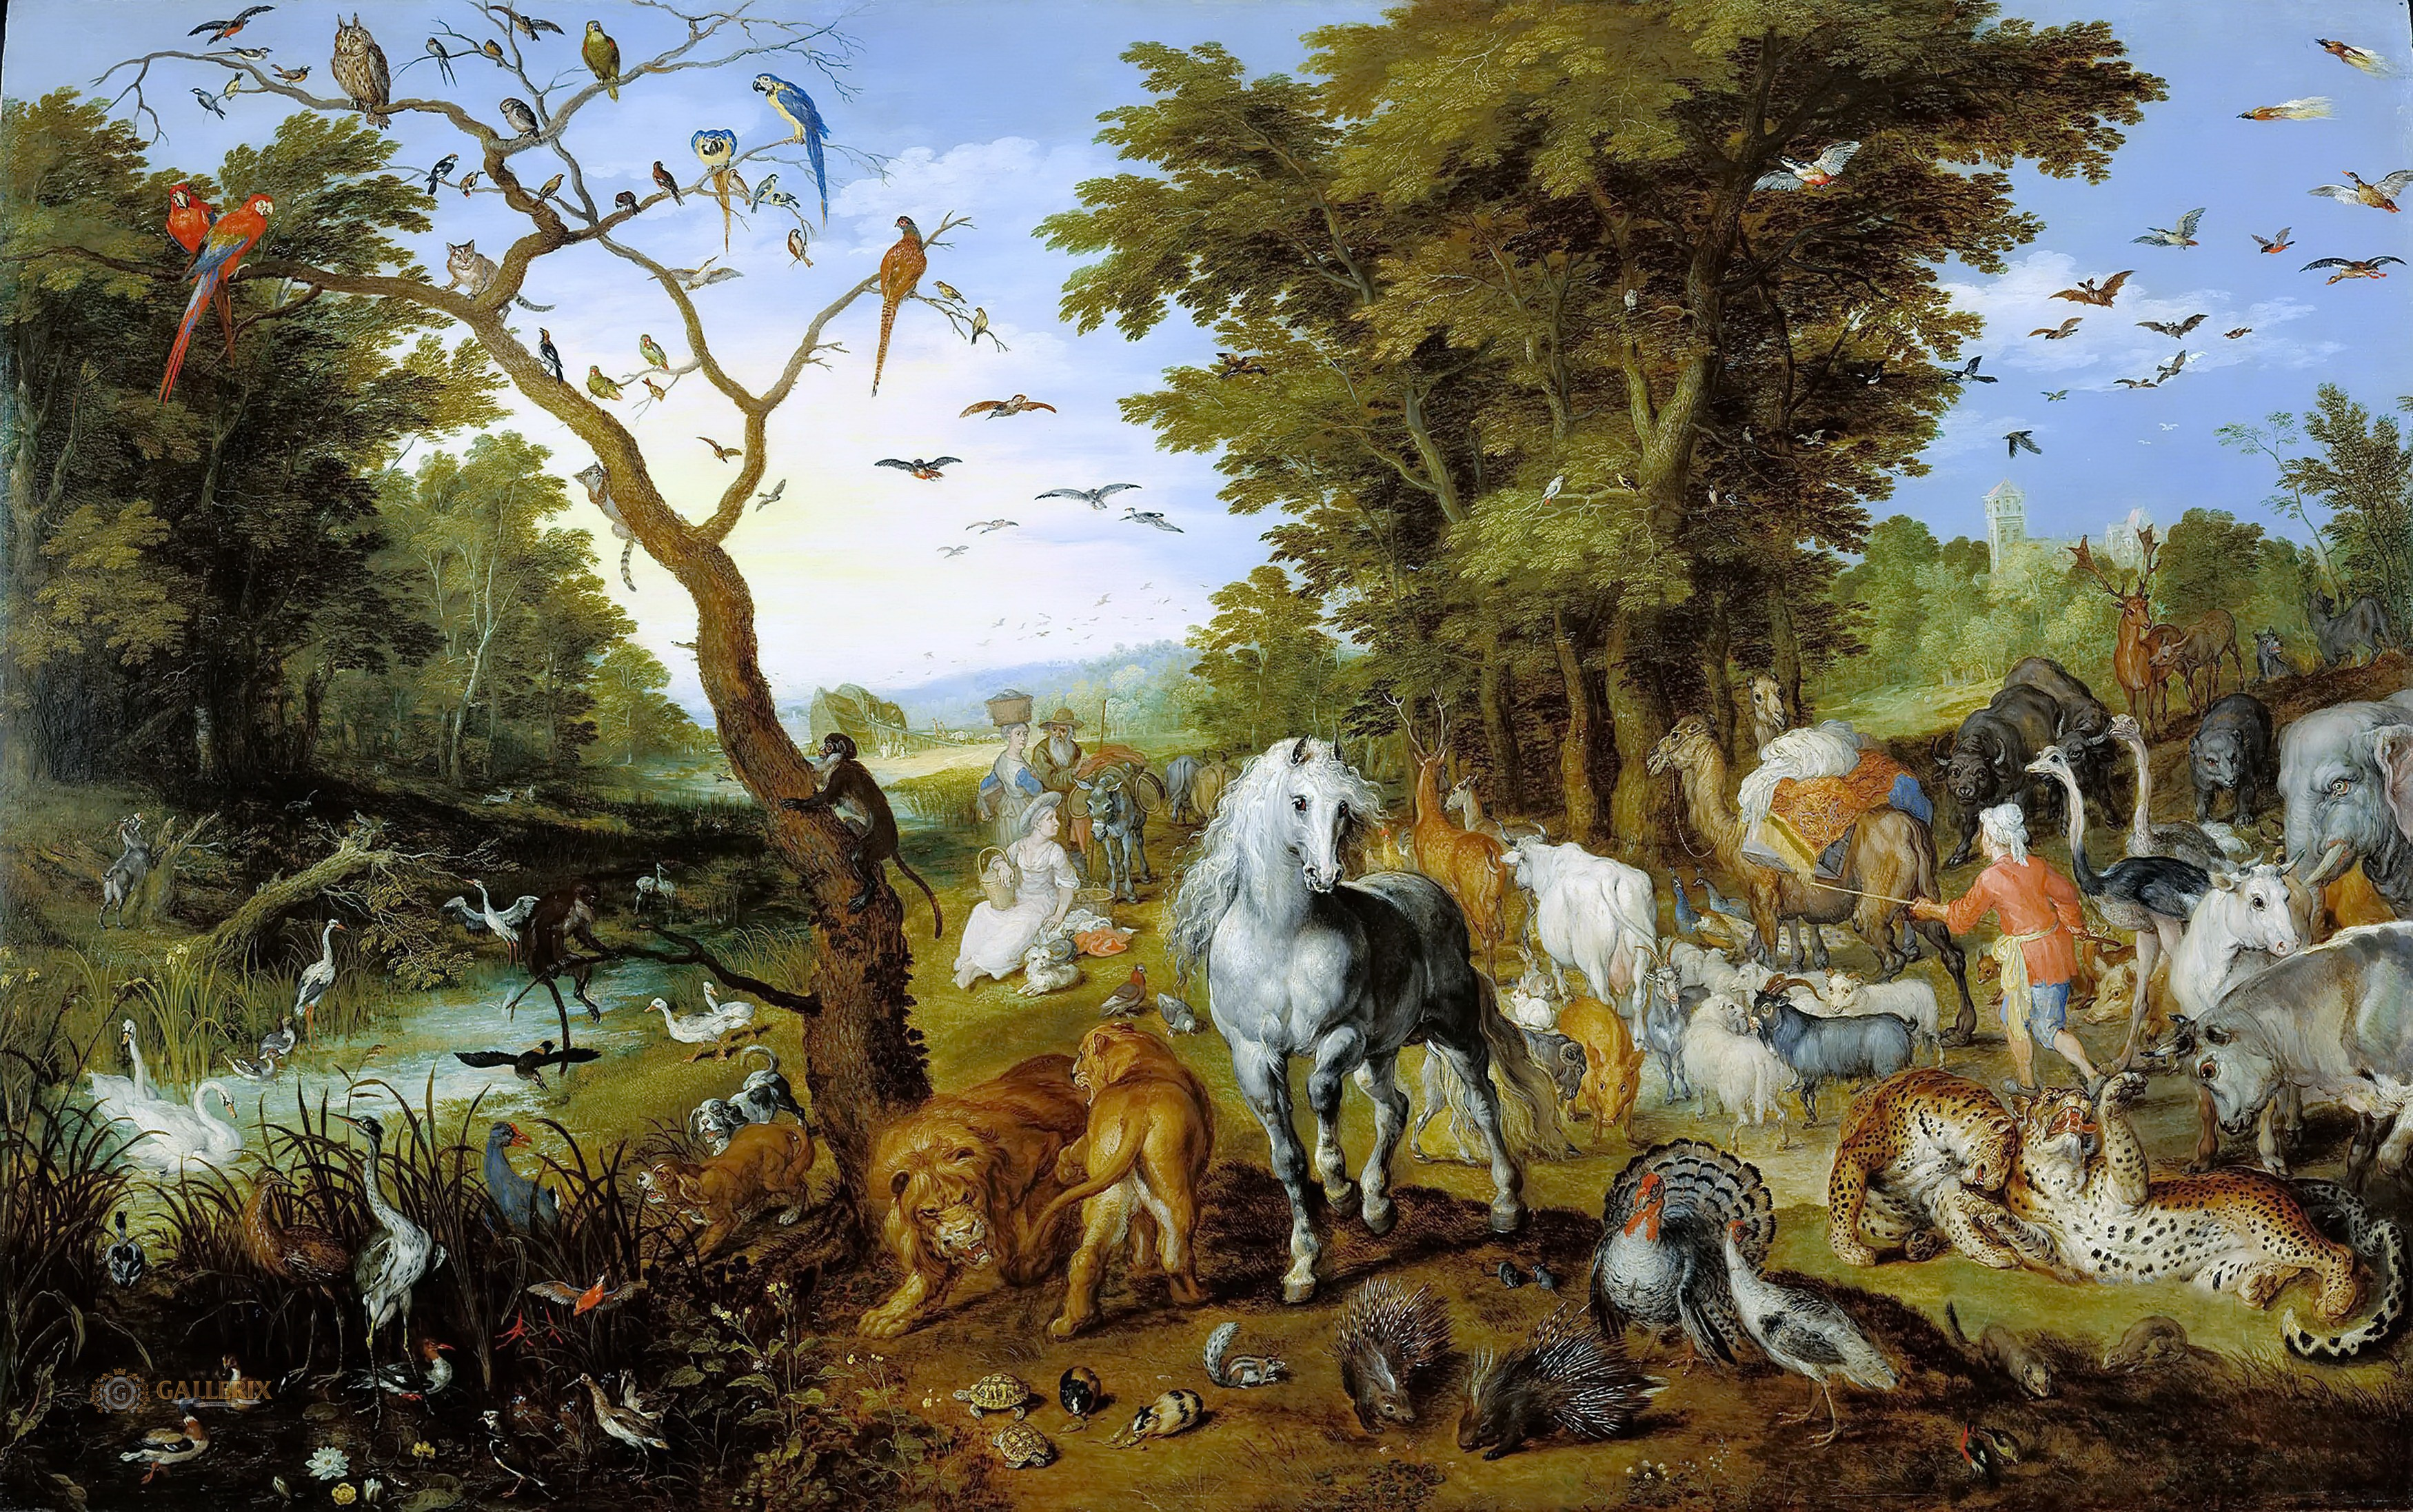 Jan Brueghel the elder, The Entry of Animals into Noah's Ark, 1613